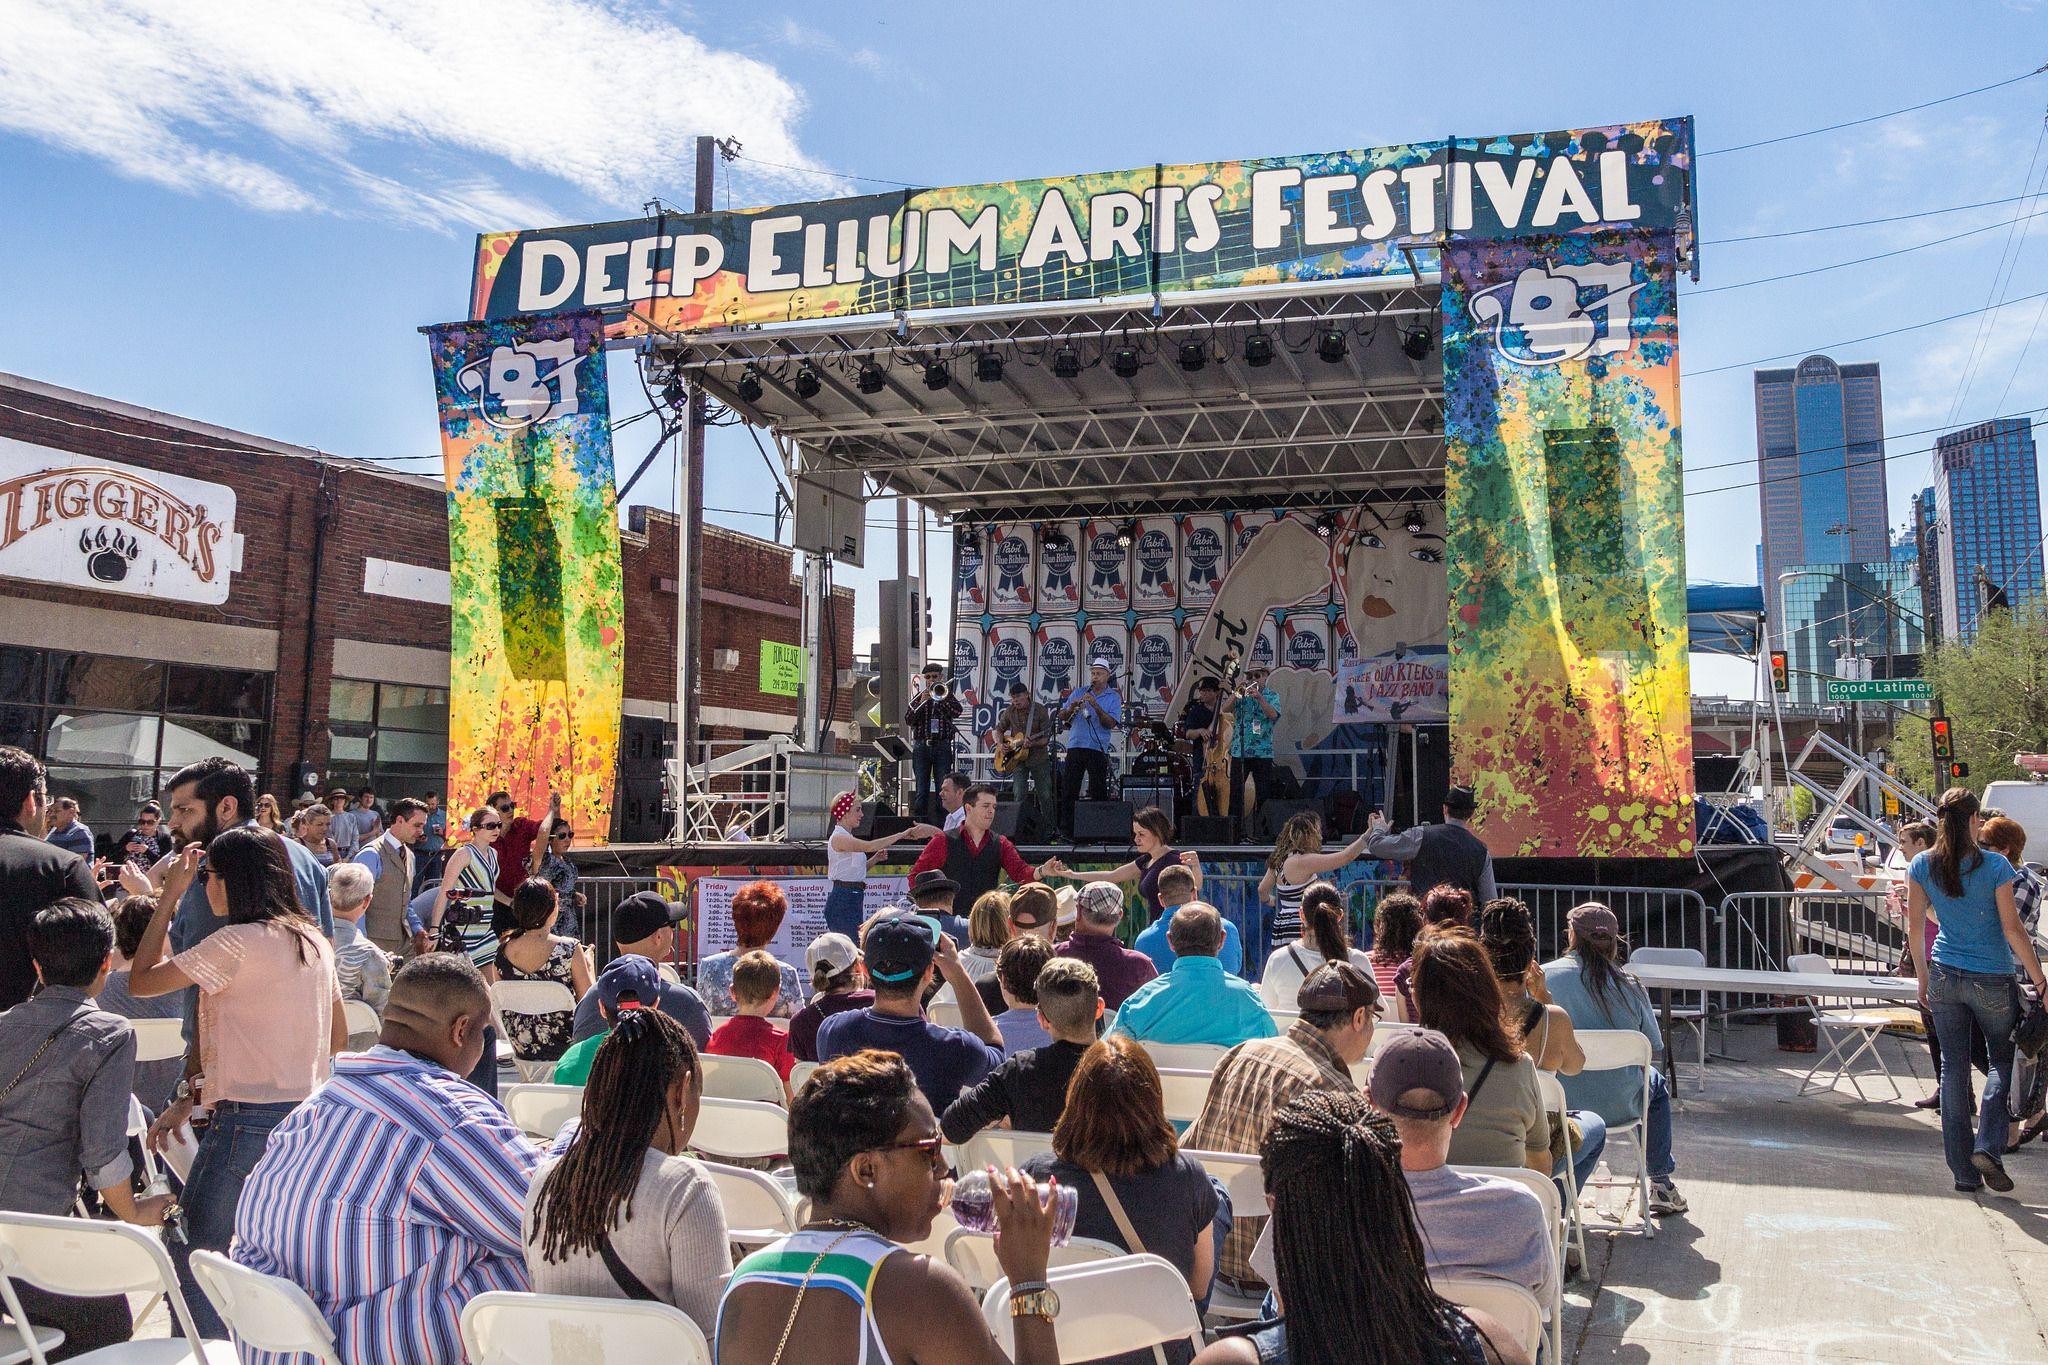 Attend the deep ellum arts festival